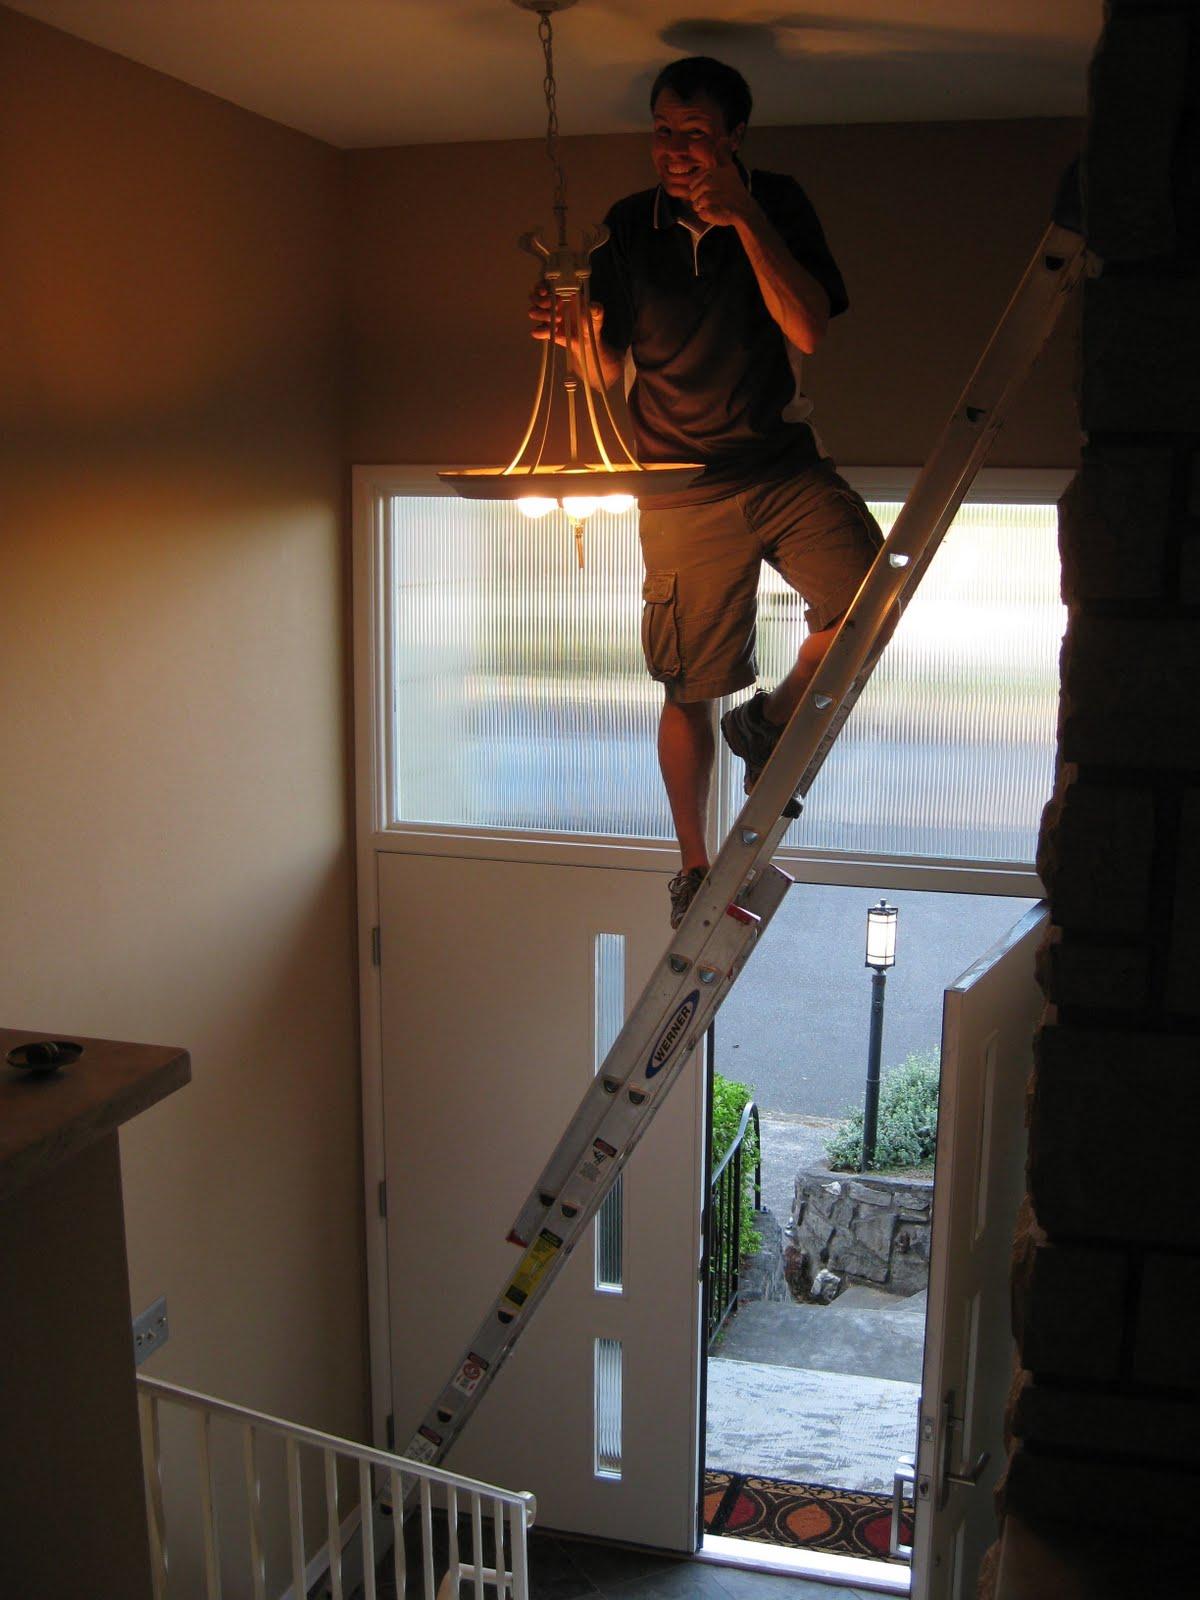 Lighting Basement Washroom Stairs: Heethar's House